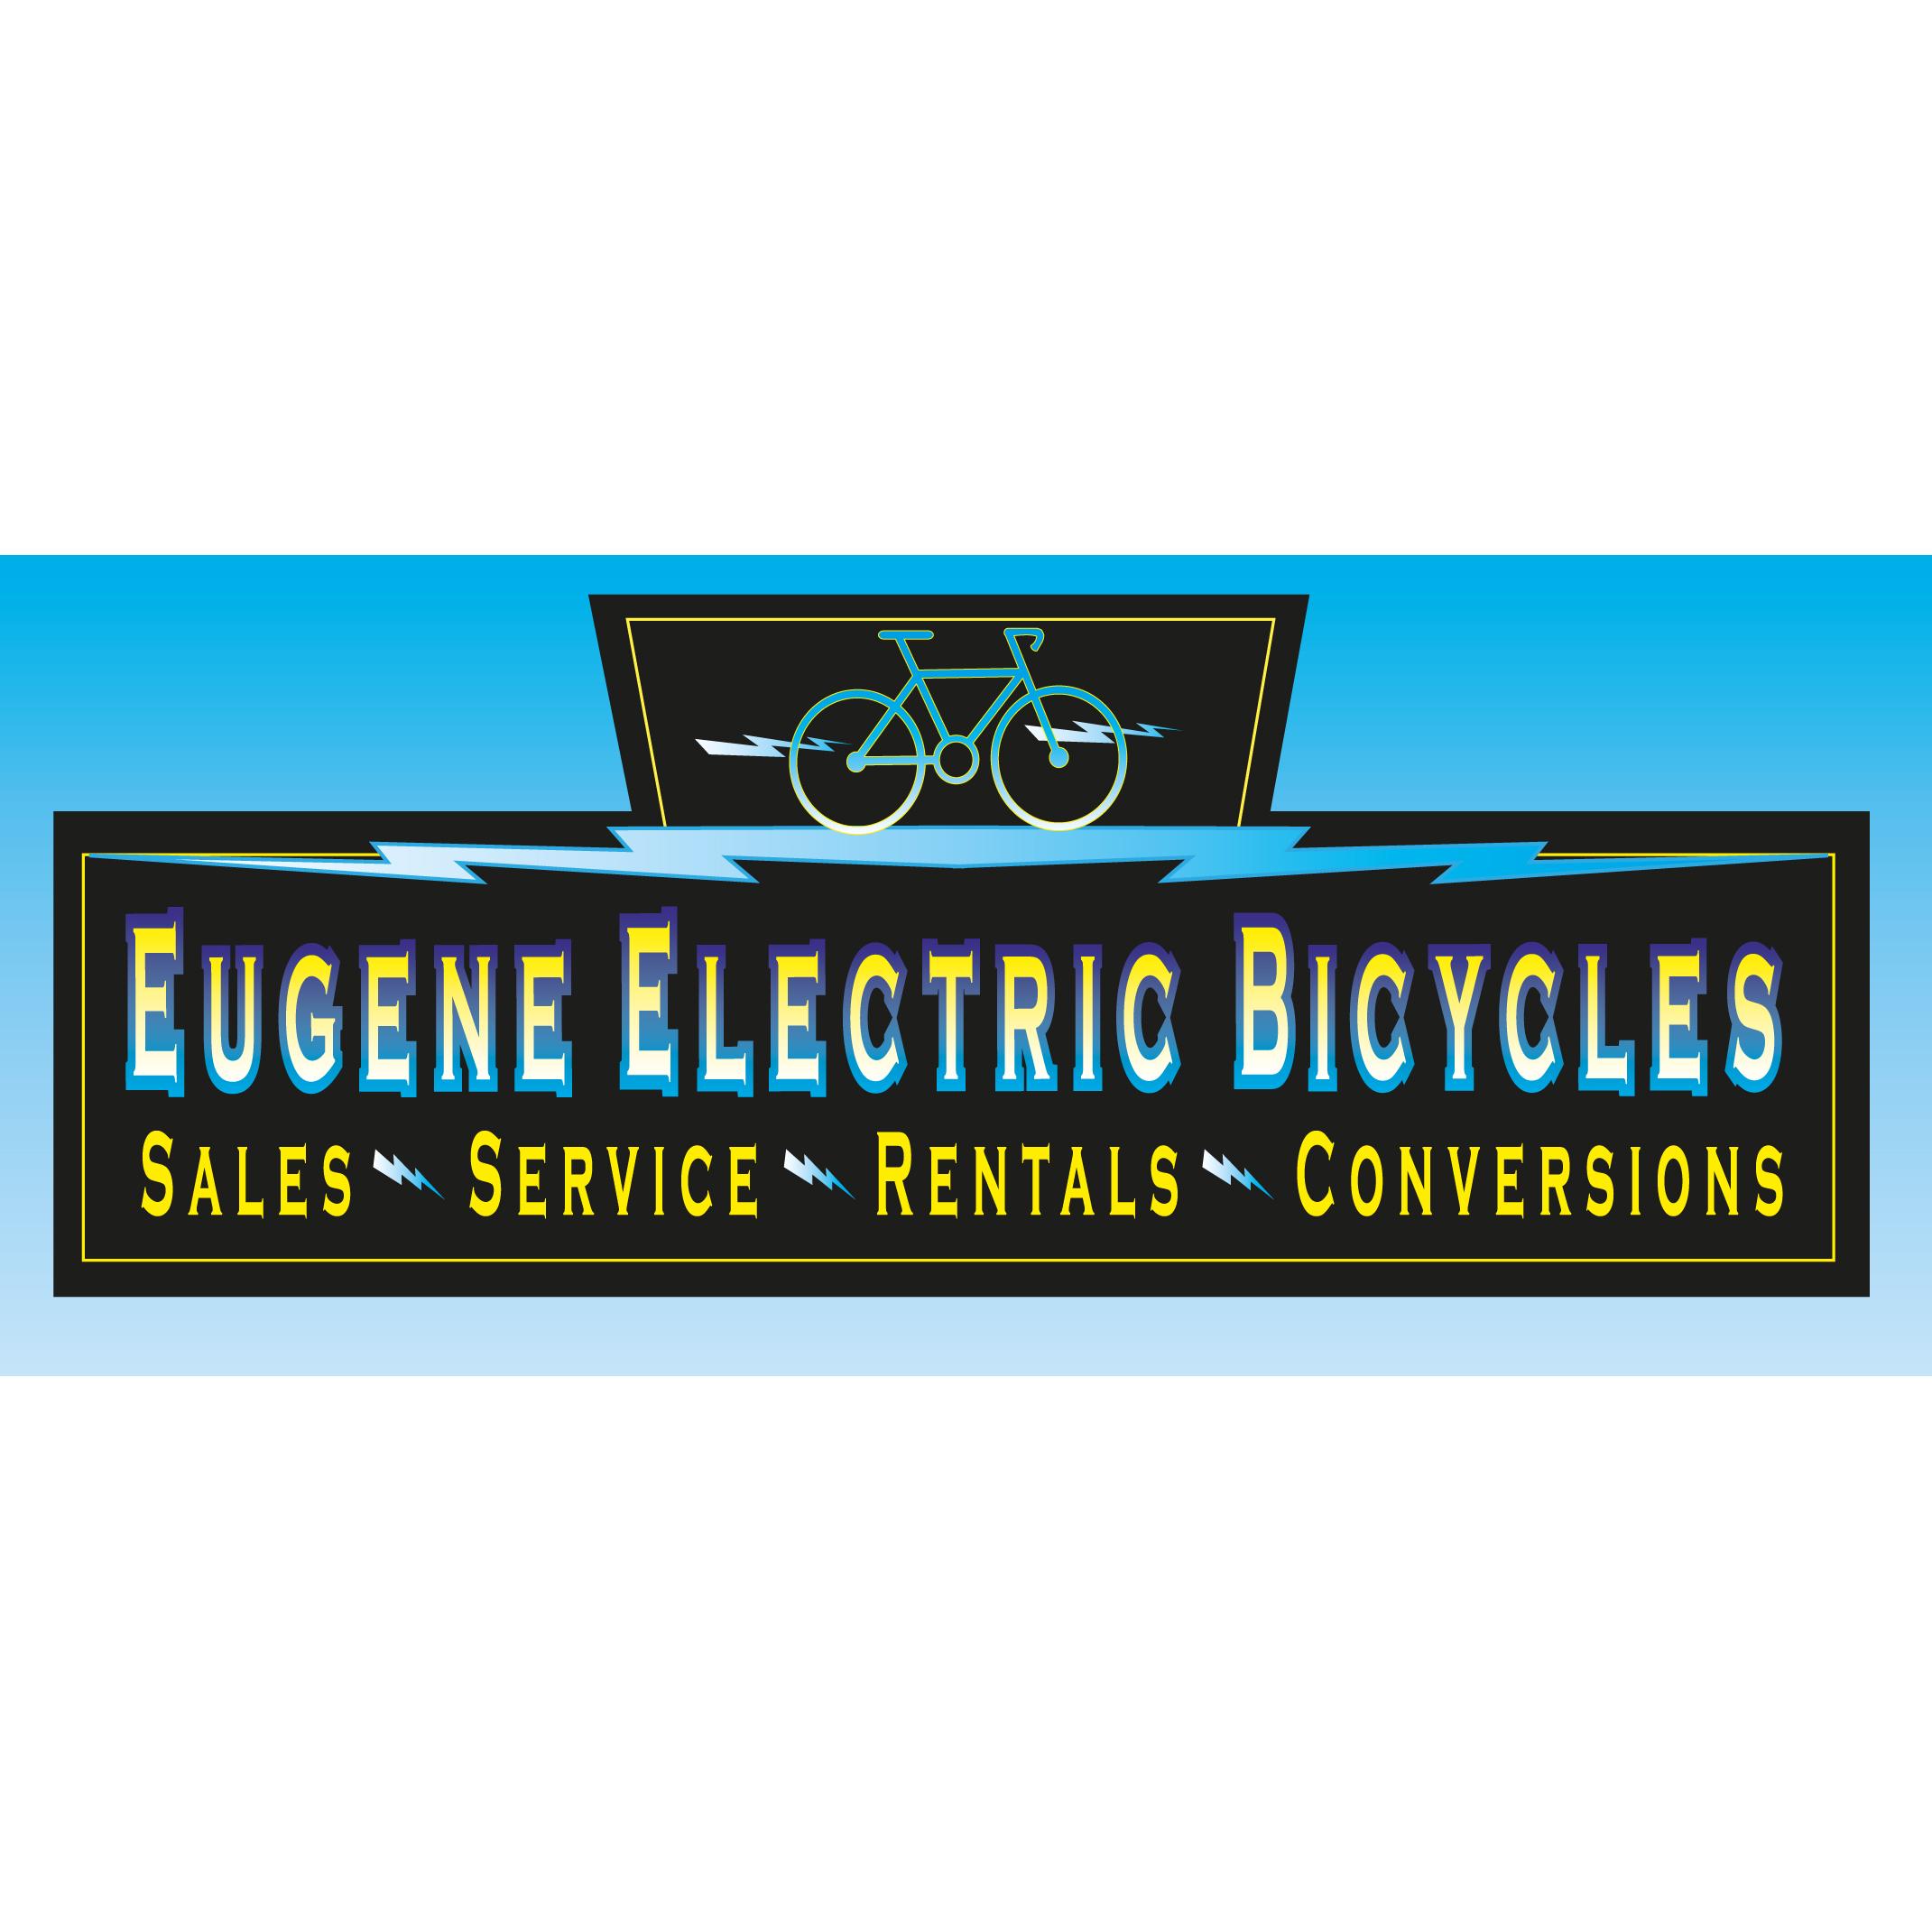 Eugene Electric Bicycles, LLC